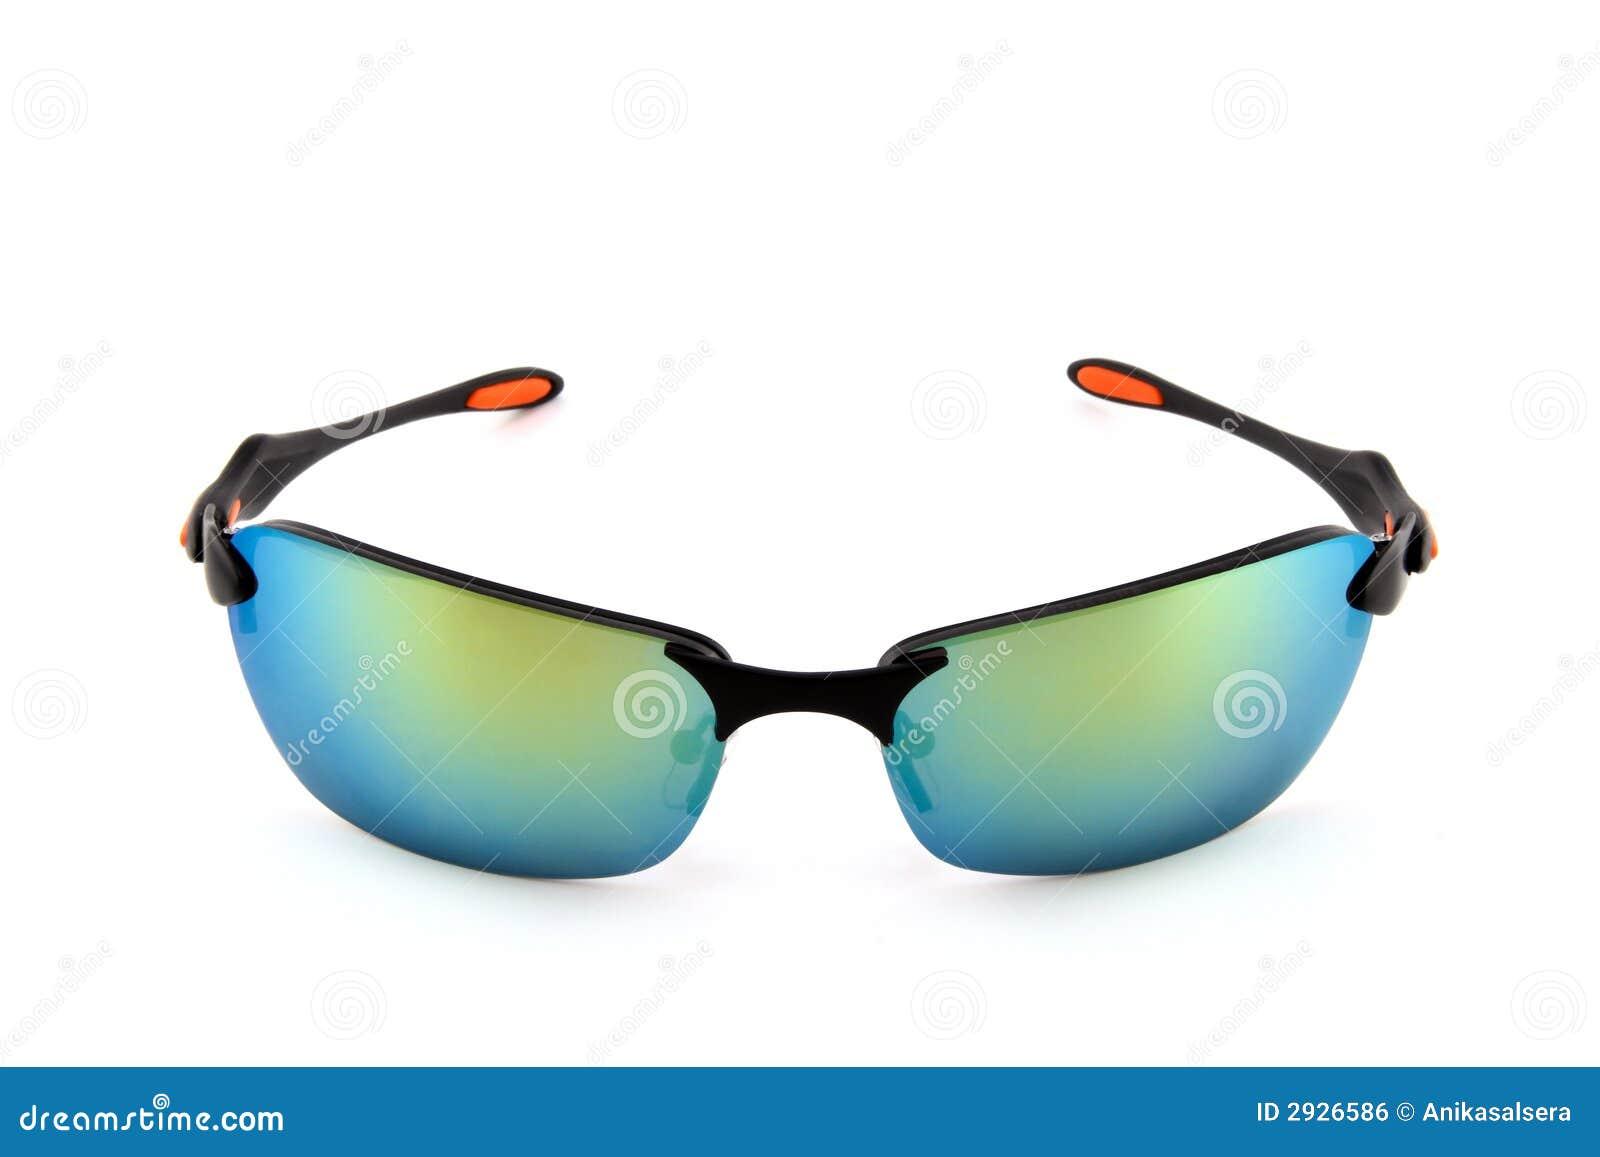 e828dd41f612 Sporty sunglasses on white stock photo. Image of plastic - 2926586